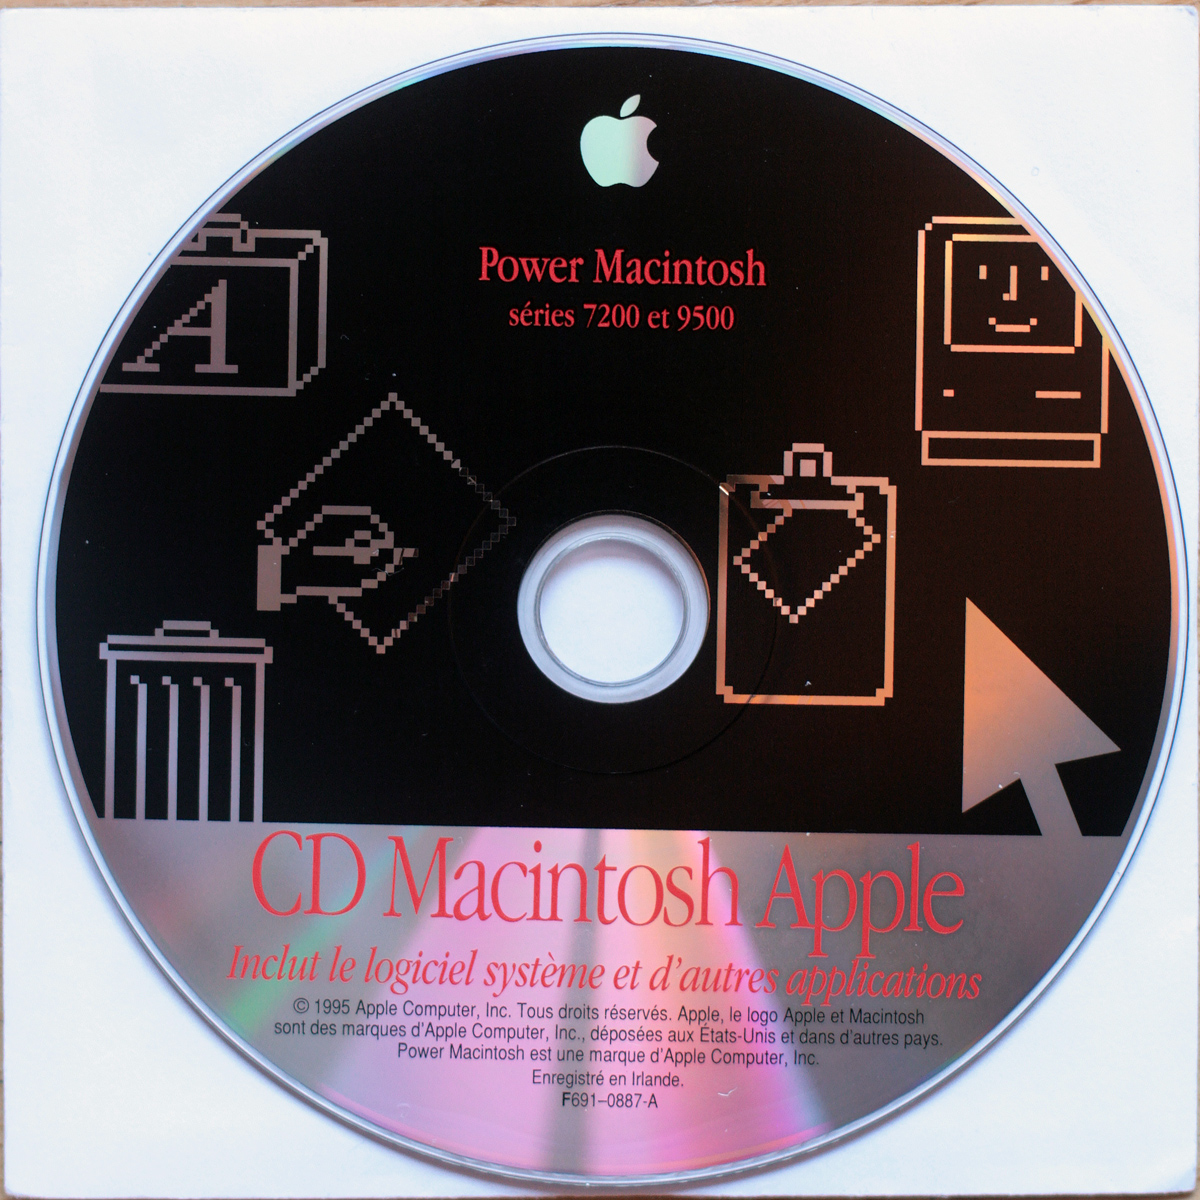 Apple Macintosh • PowerMacintosh 7200 & 9500 • CD d'installation • Install software • OS 7.5.3 • Francais • 1995